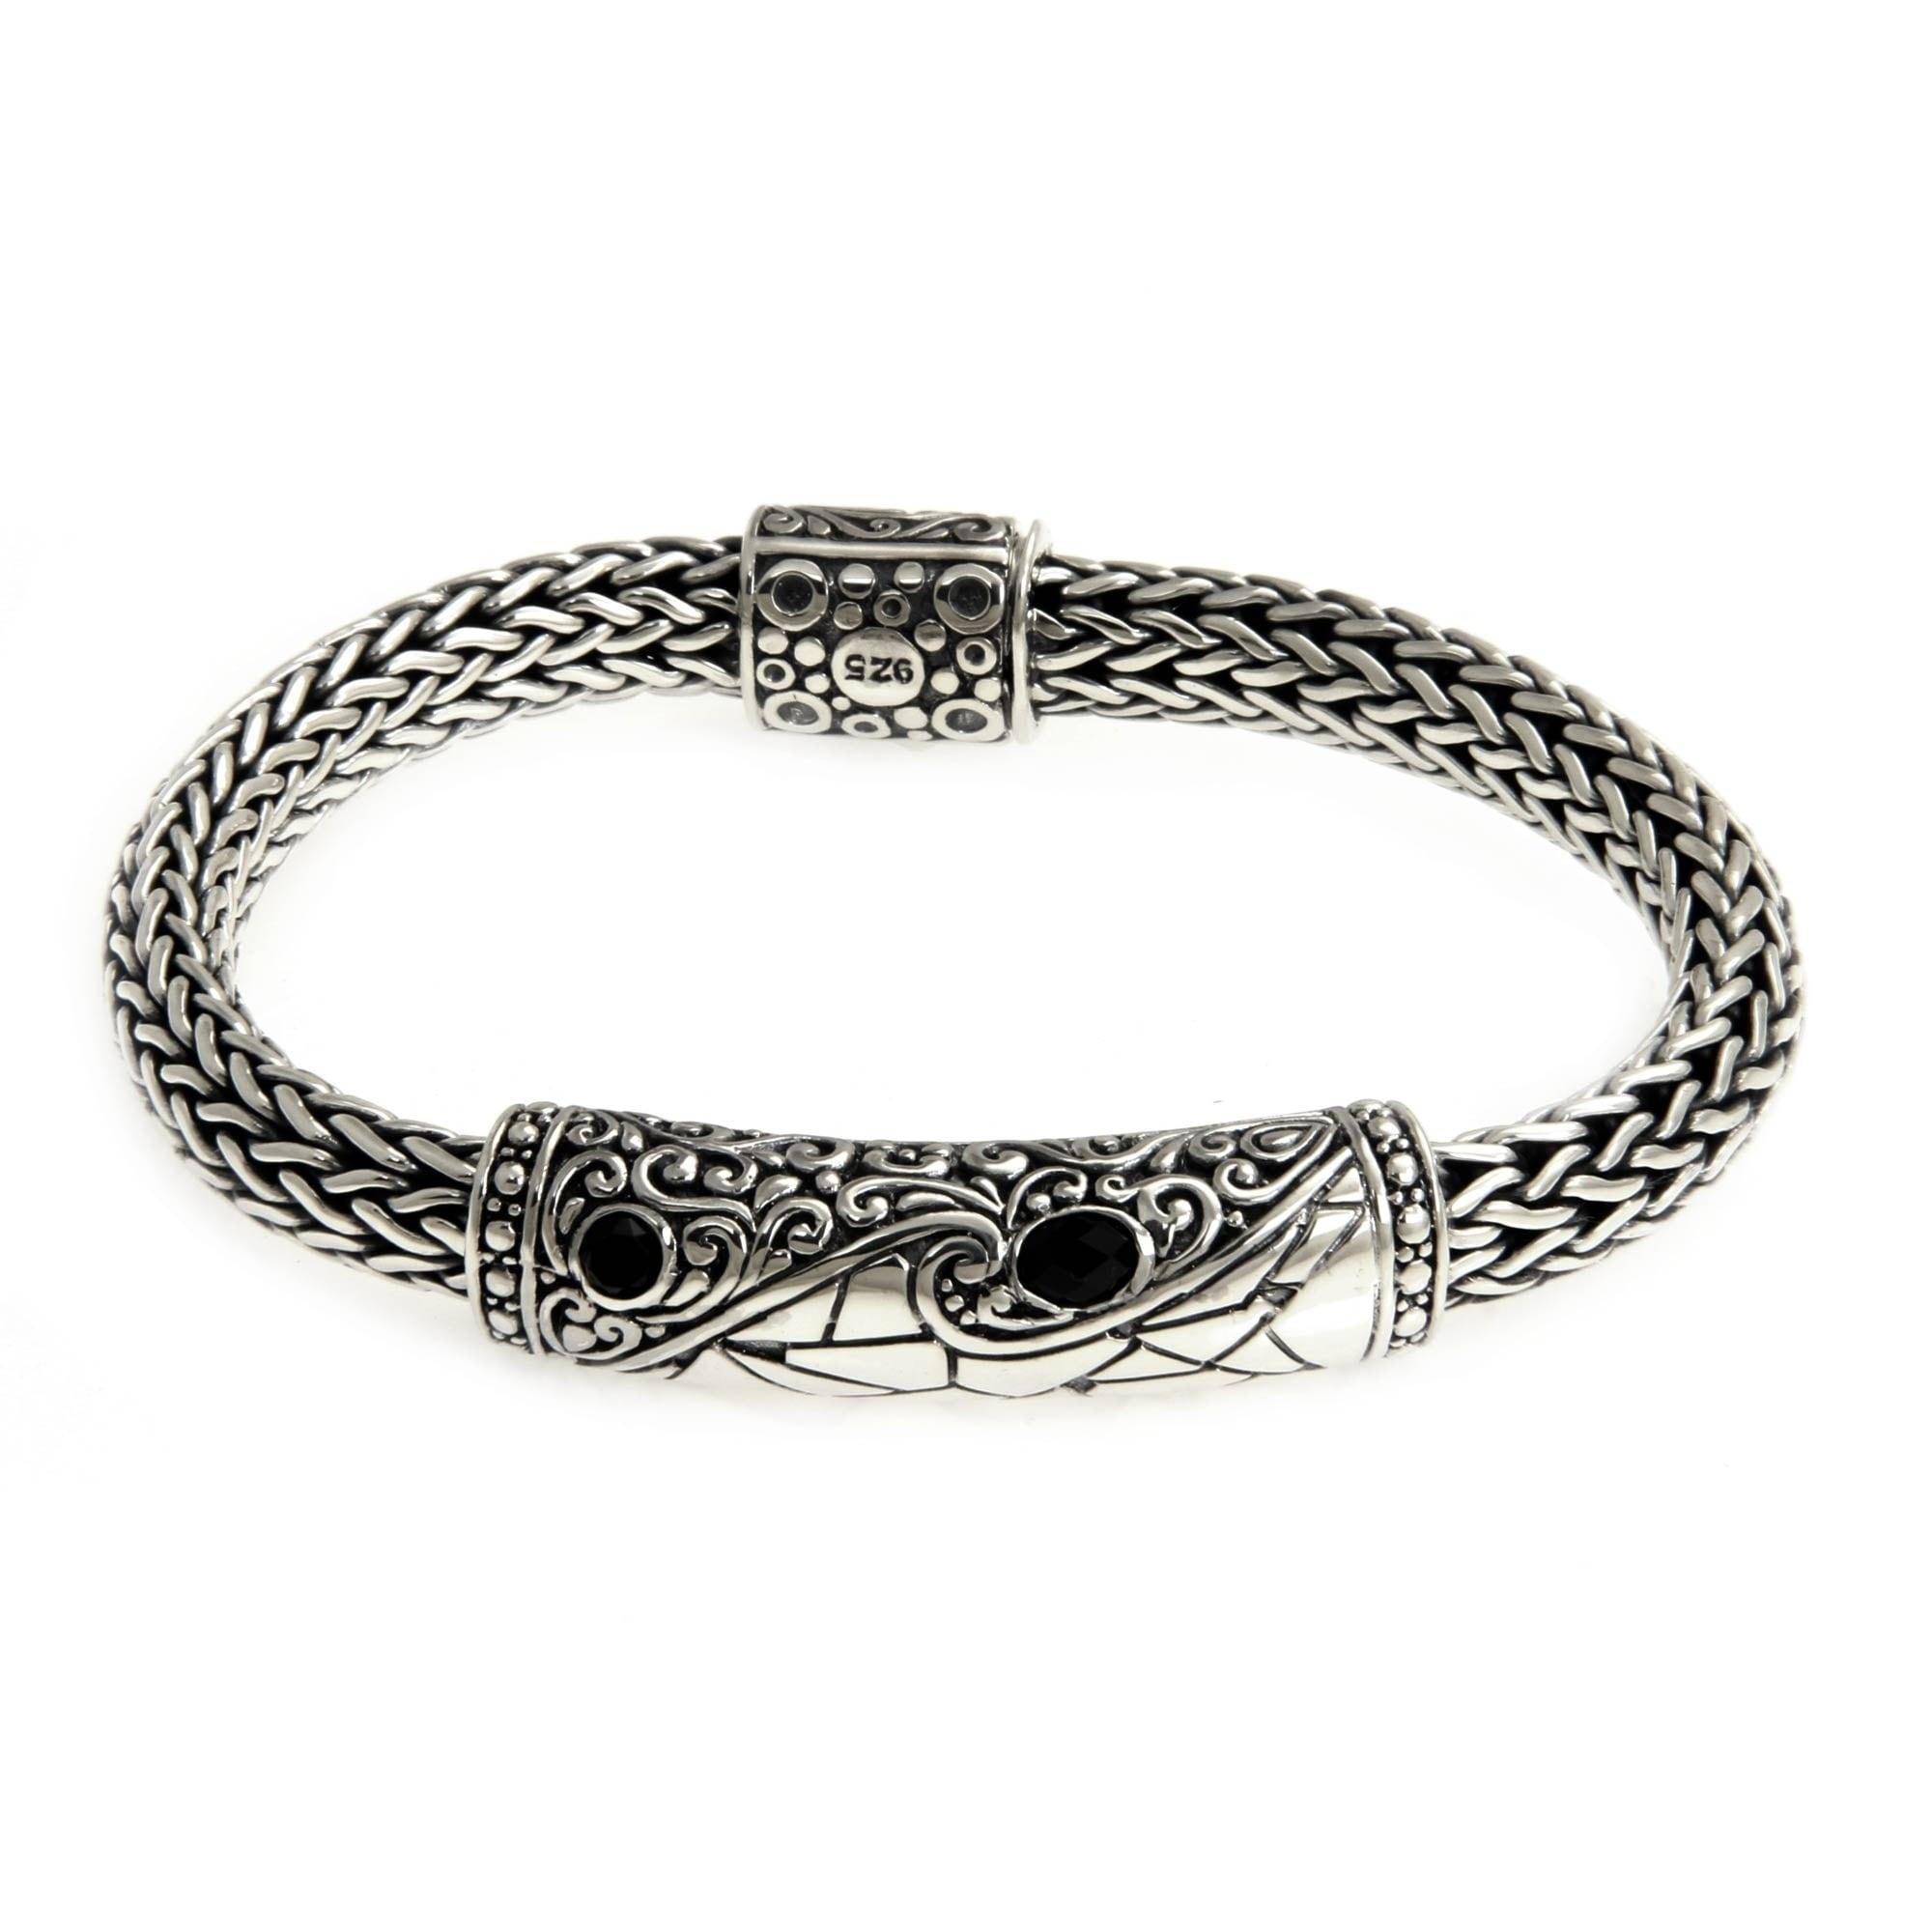 Fine Jewellery Fine Bracelets Rapture Vintage Sterling Silver Square Link Bracelet Solid .925 Silver 7 Inches Moderate Price